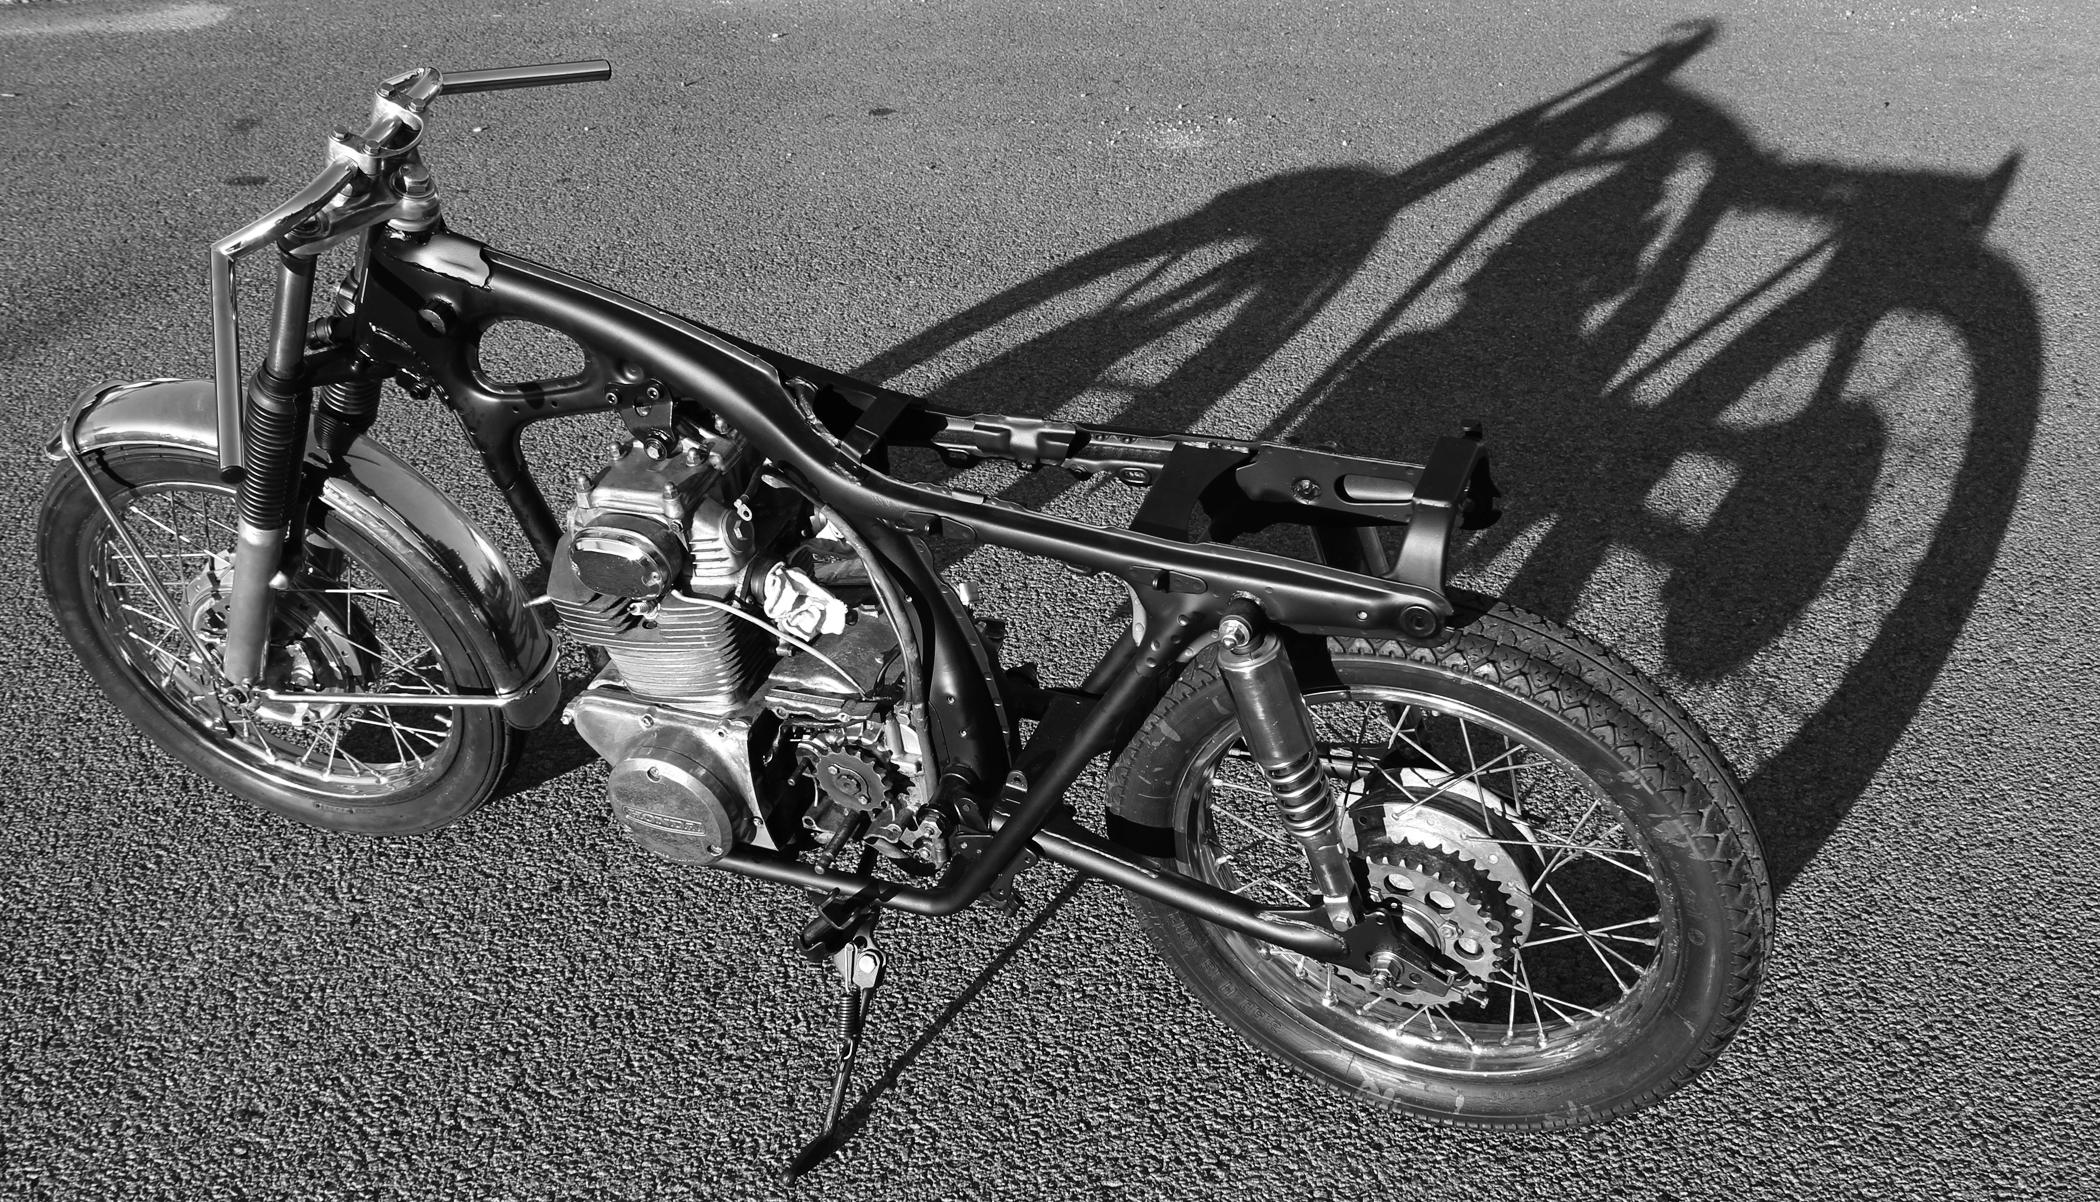 1971 Honda Cb350 Cafe Racer Episode 5 Rolling Chassy